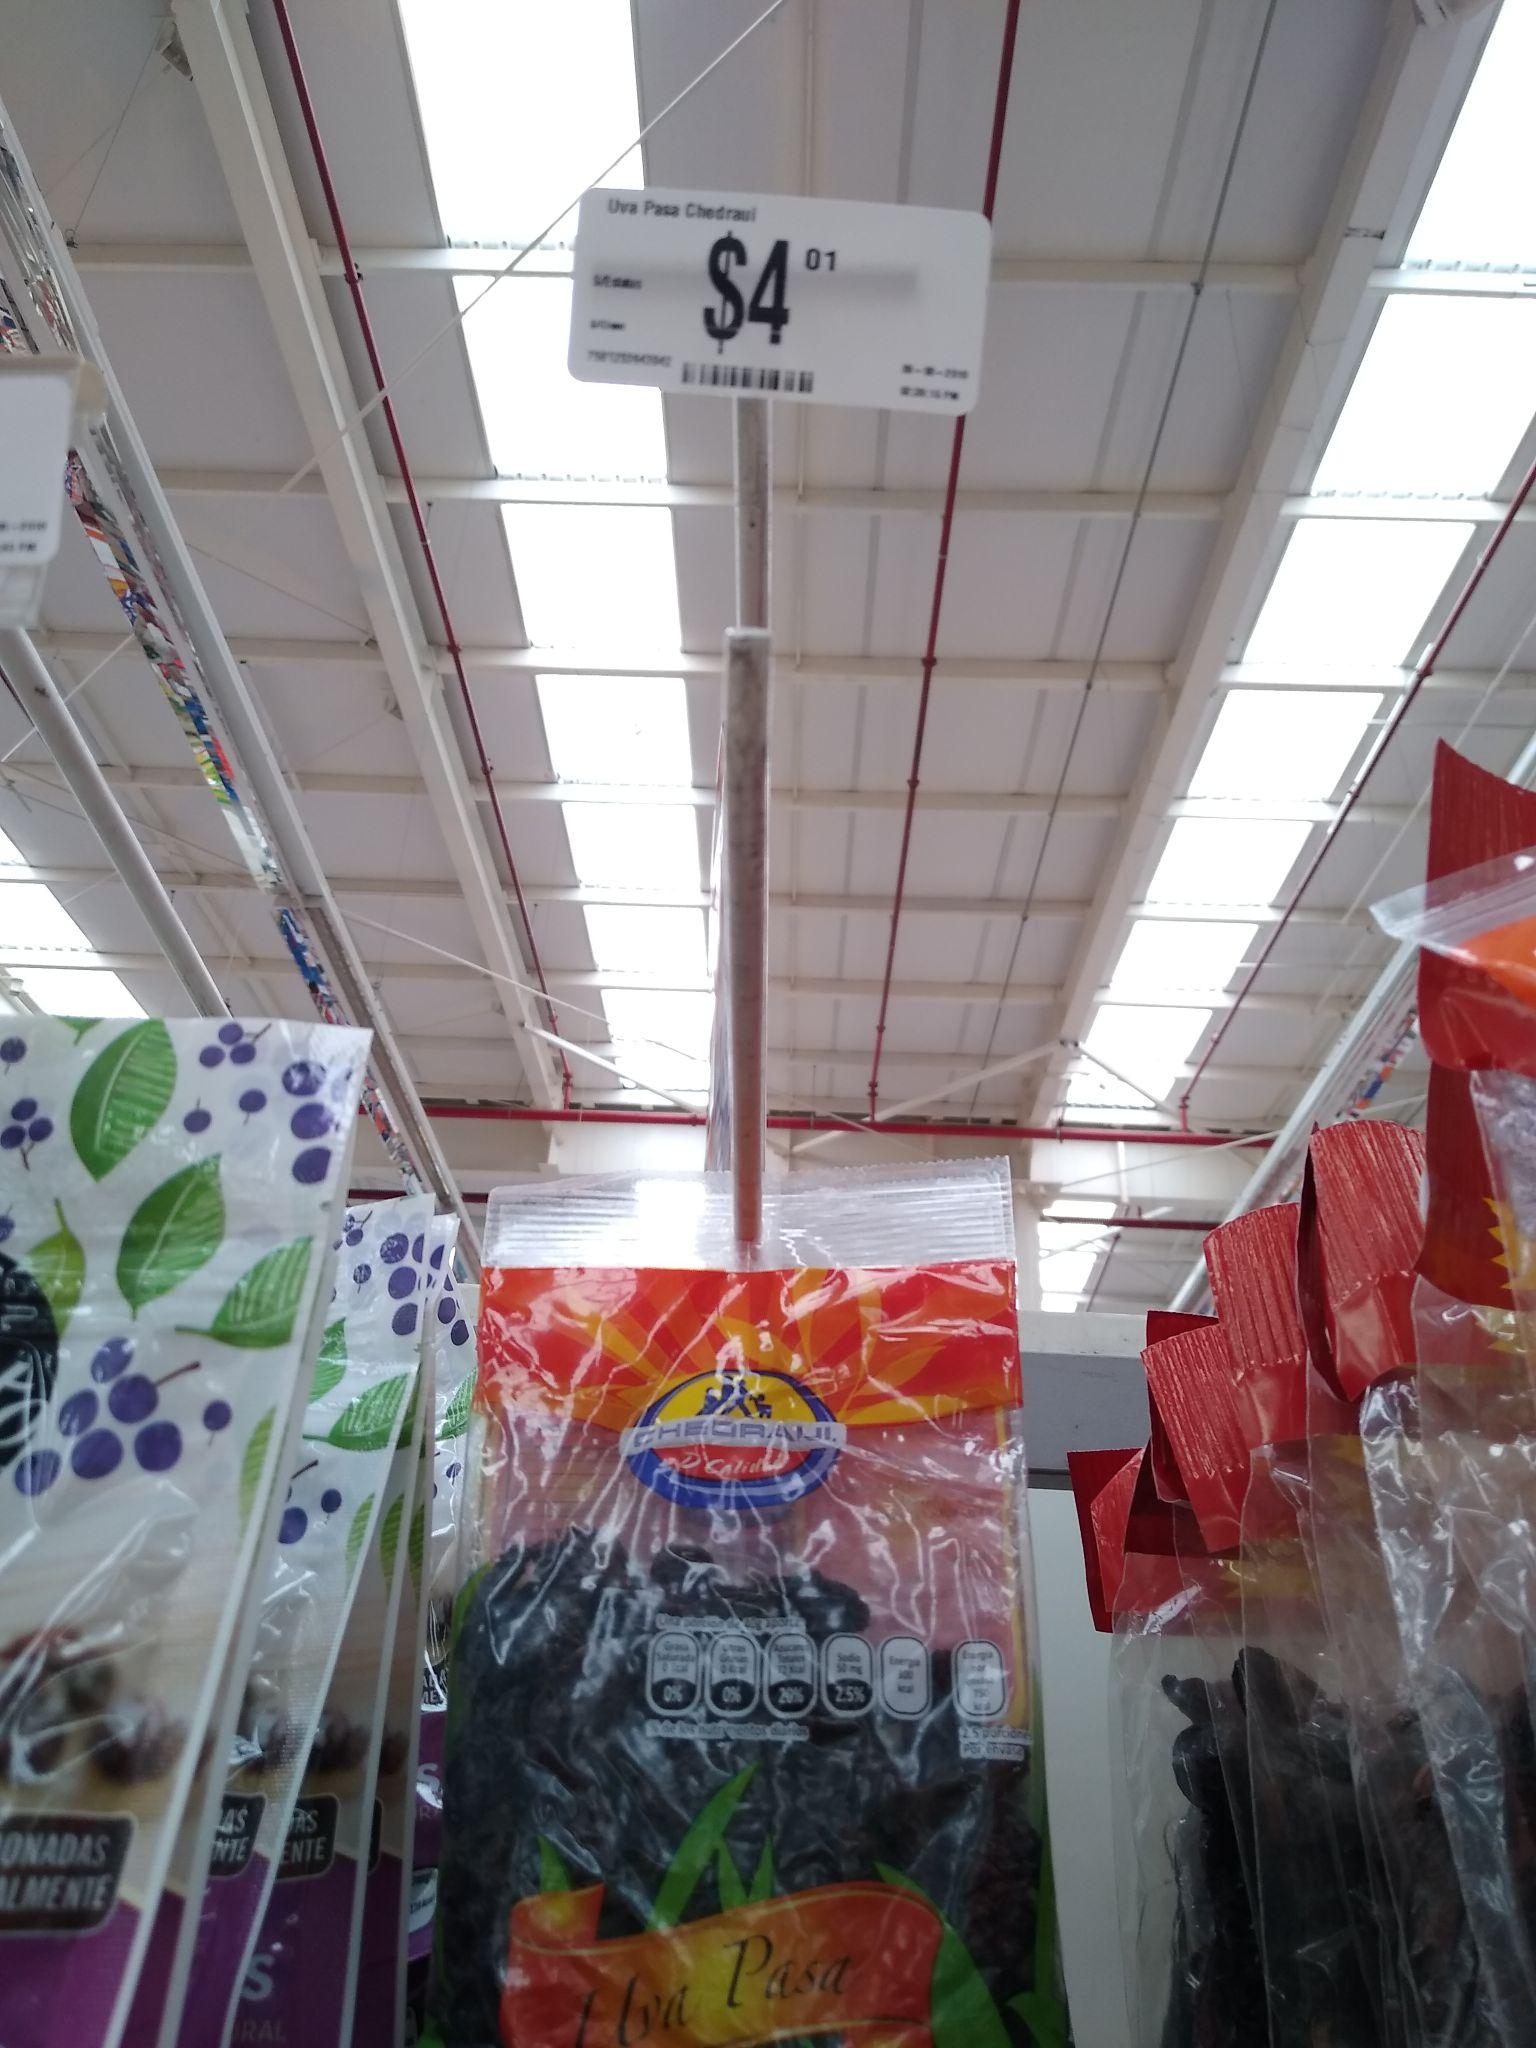 Chedraui: bolsa de uva pasas de 100gr a $4